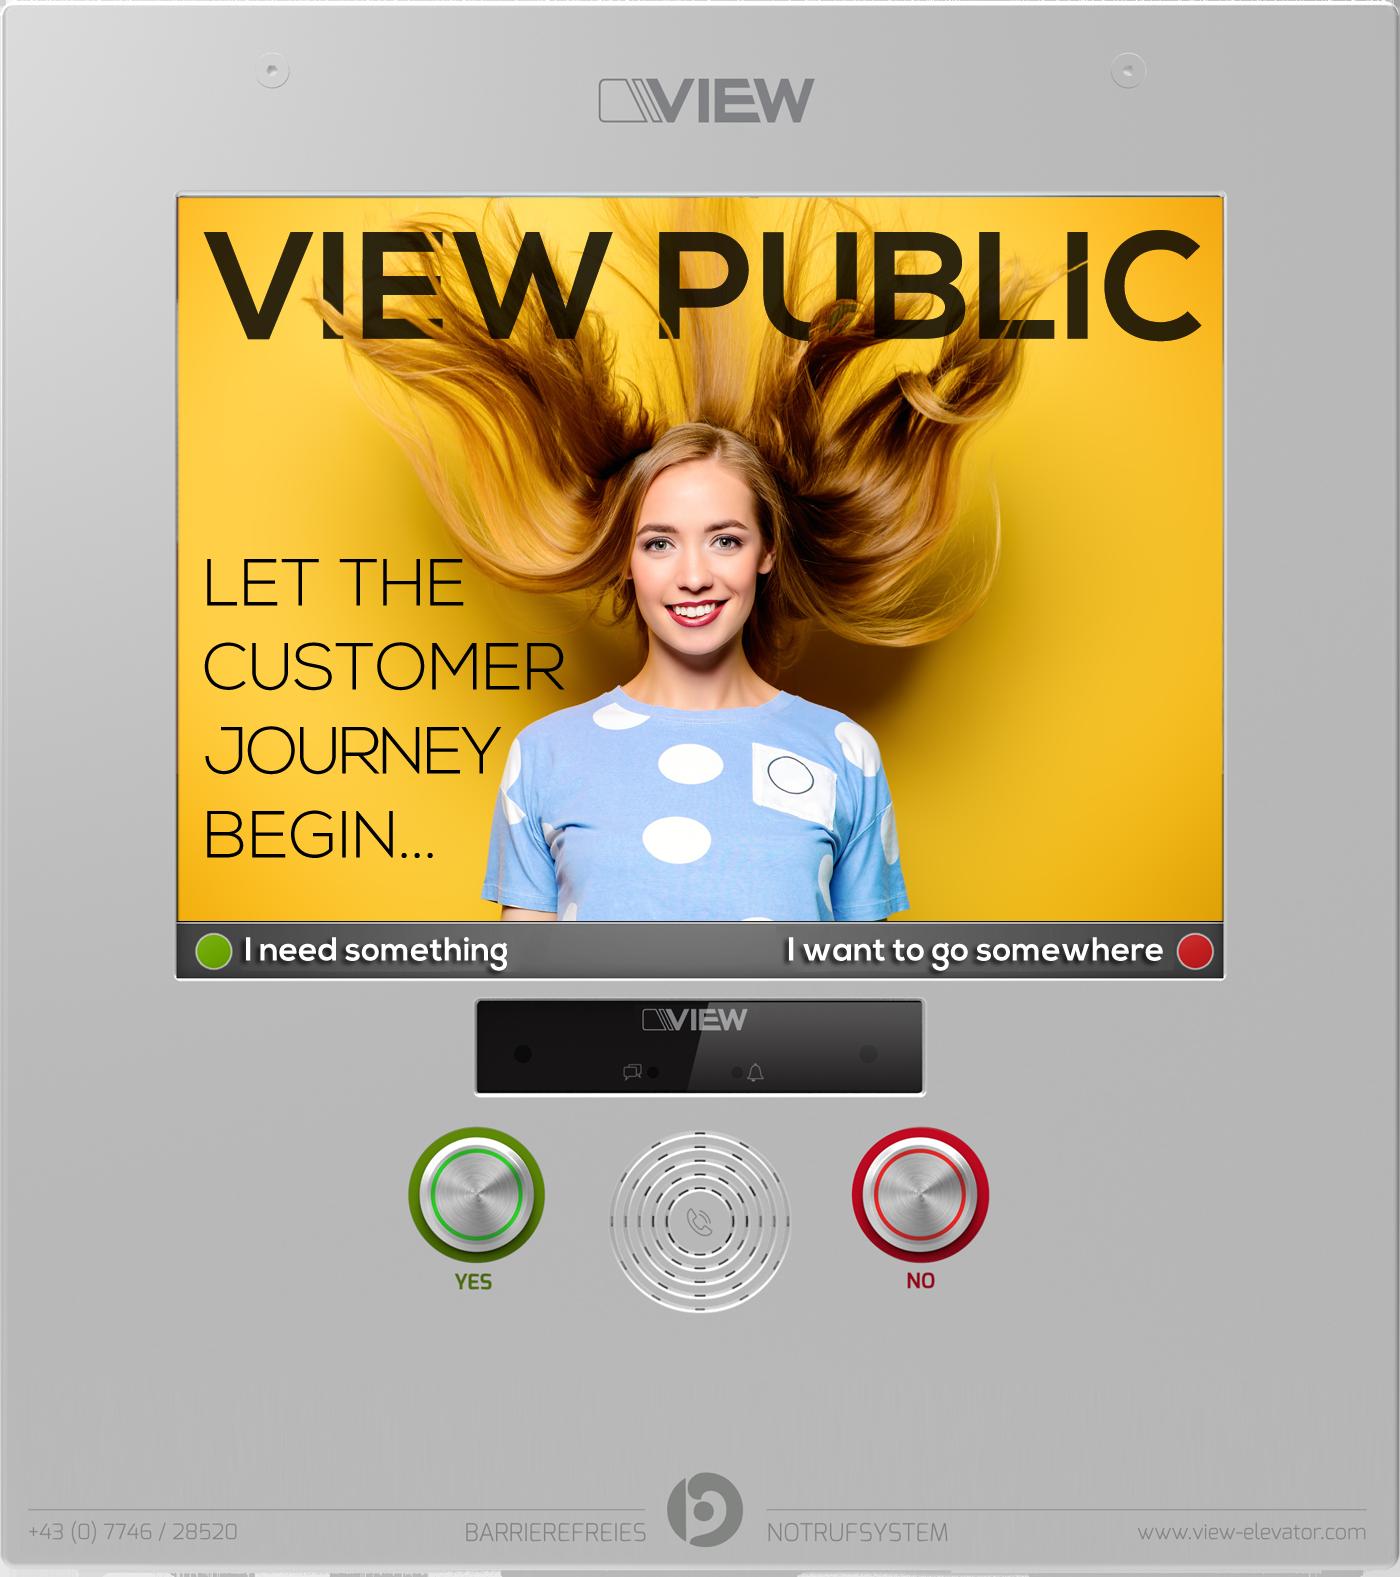 VIEW_PUBLIC__Tablet.png